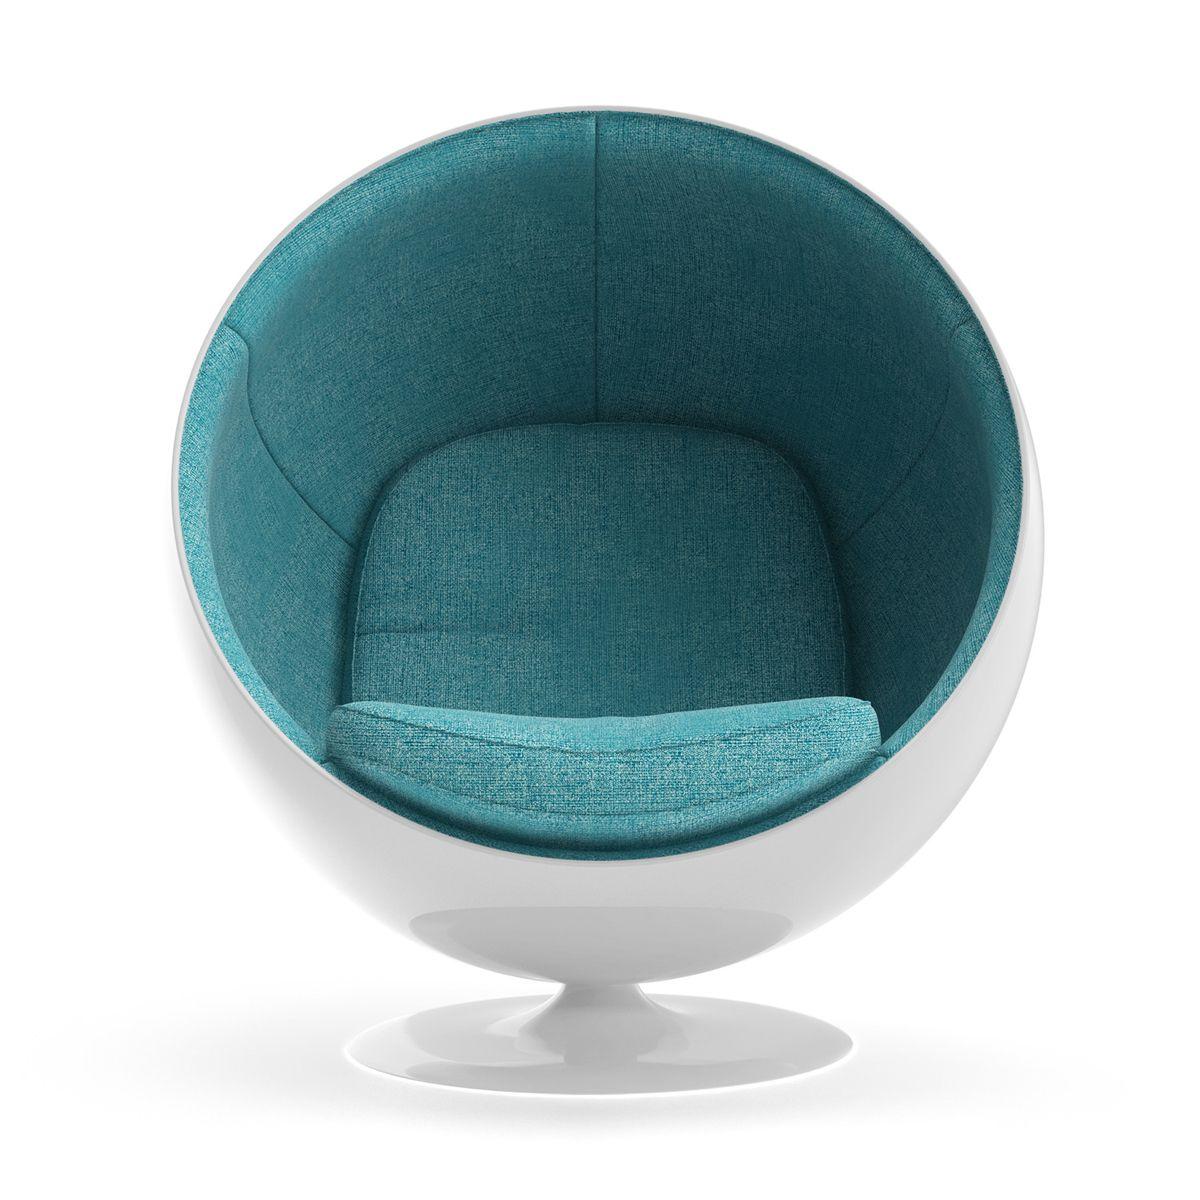 Eero aarnio ball chair ball chair bubble chair blue